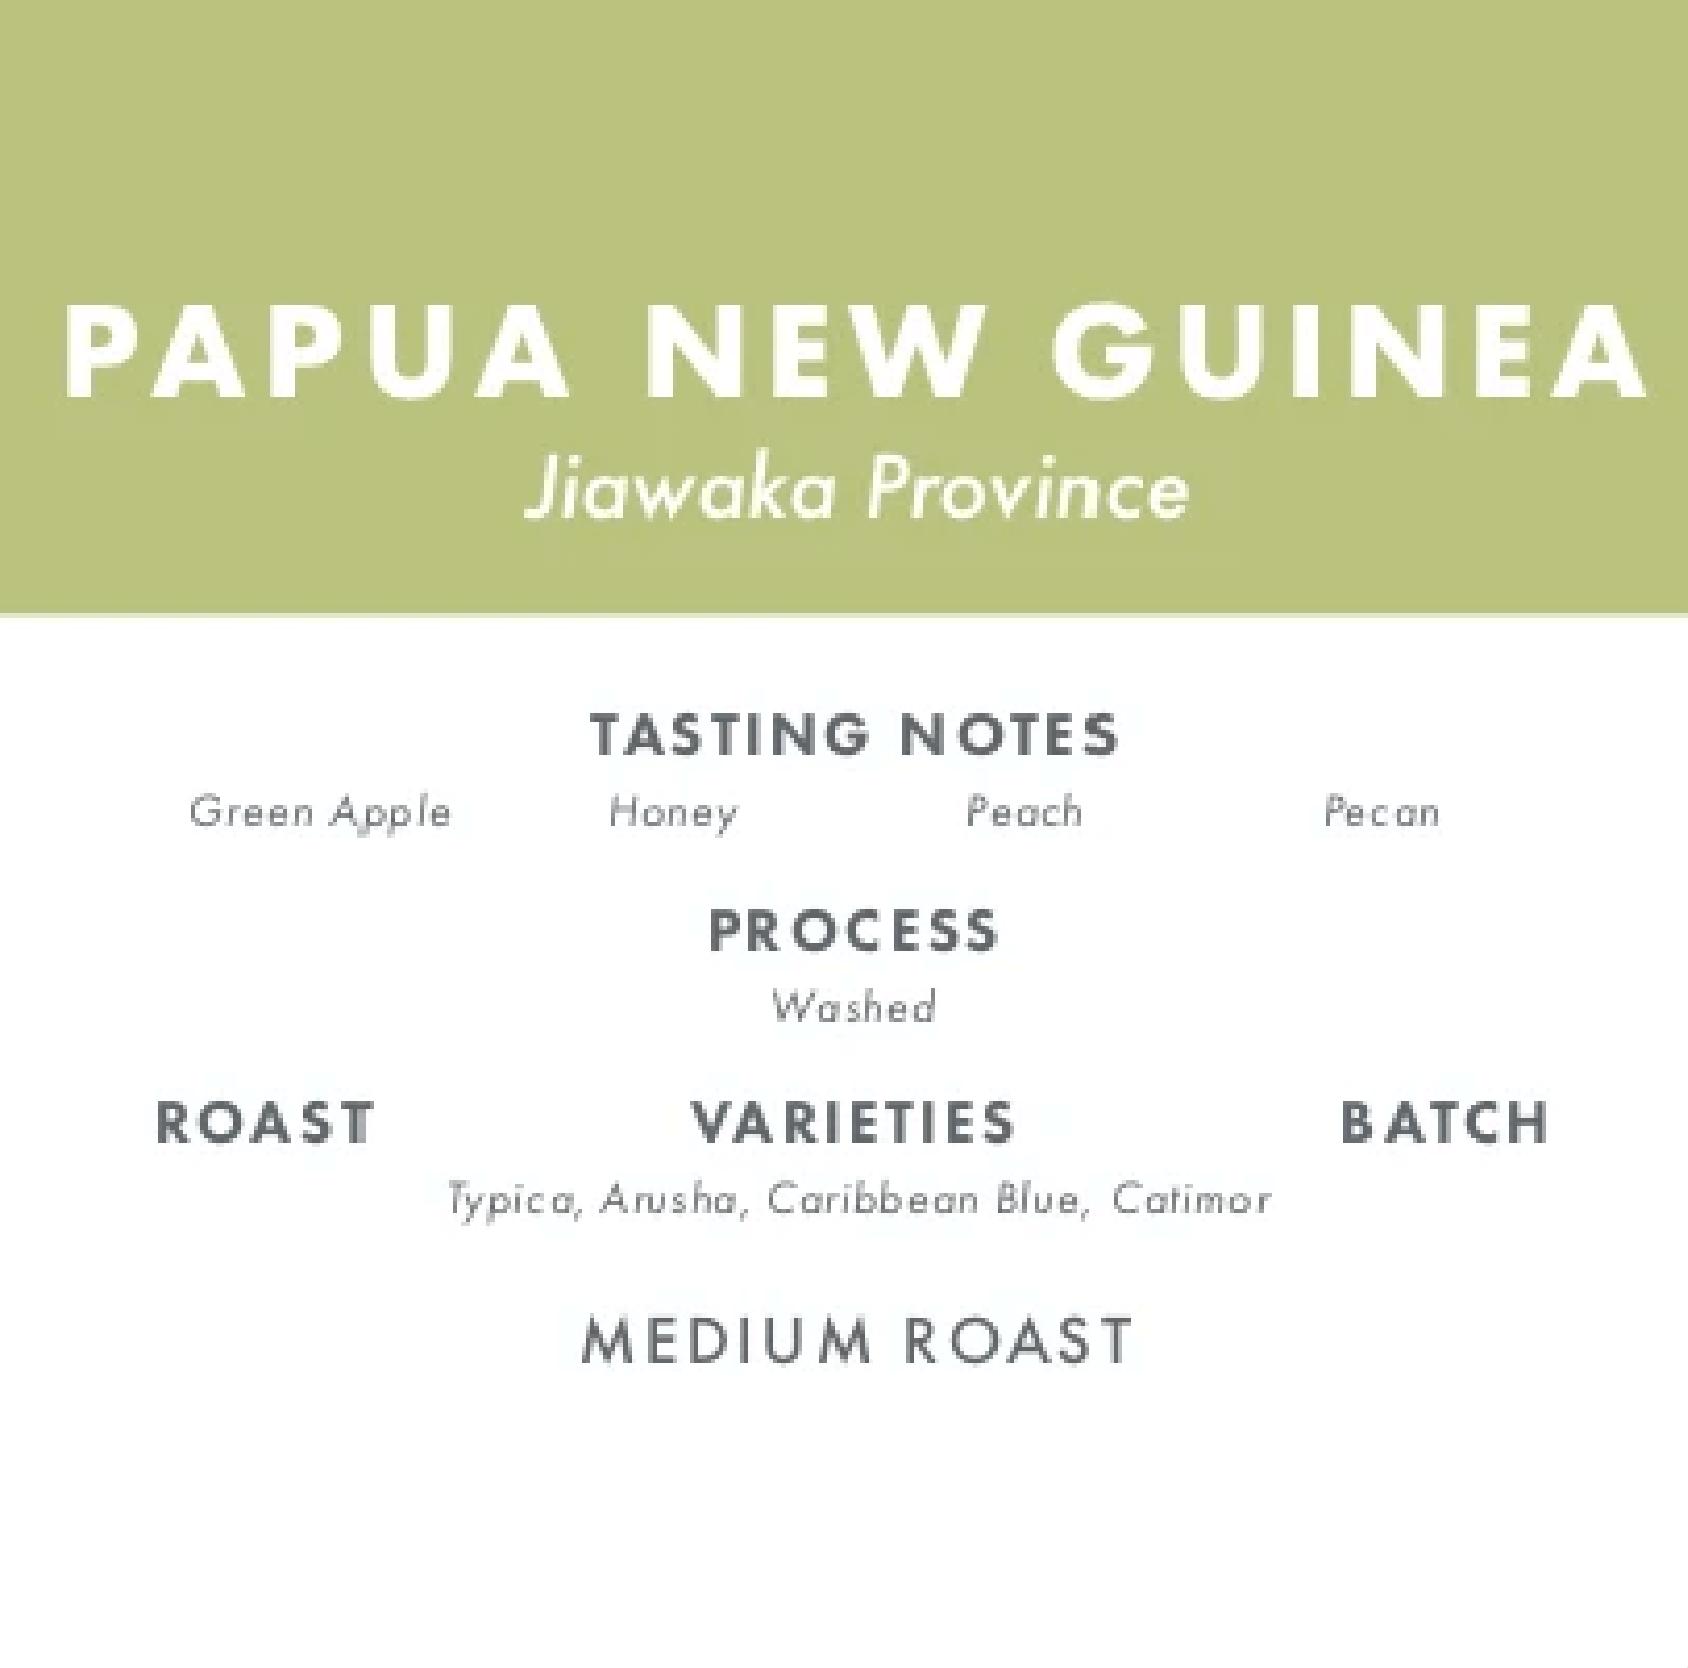 Papua New Guinea - Jiawaka Province from Polite Coffee